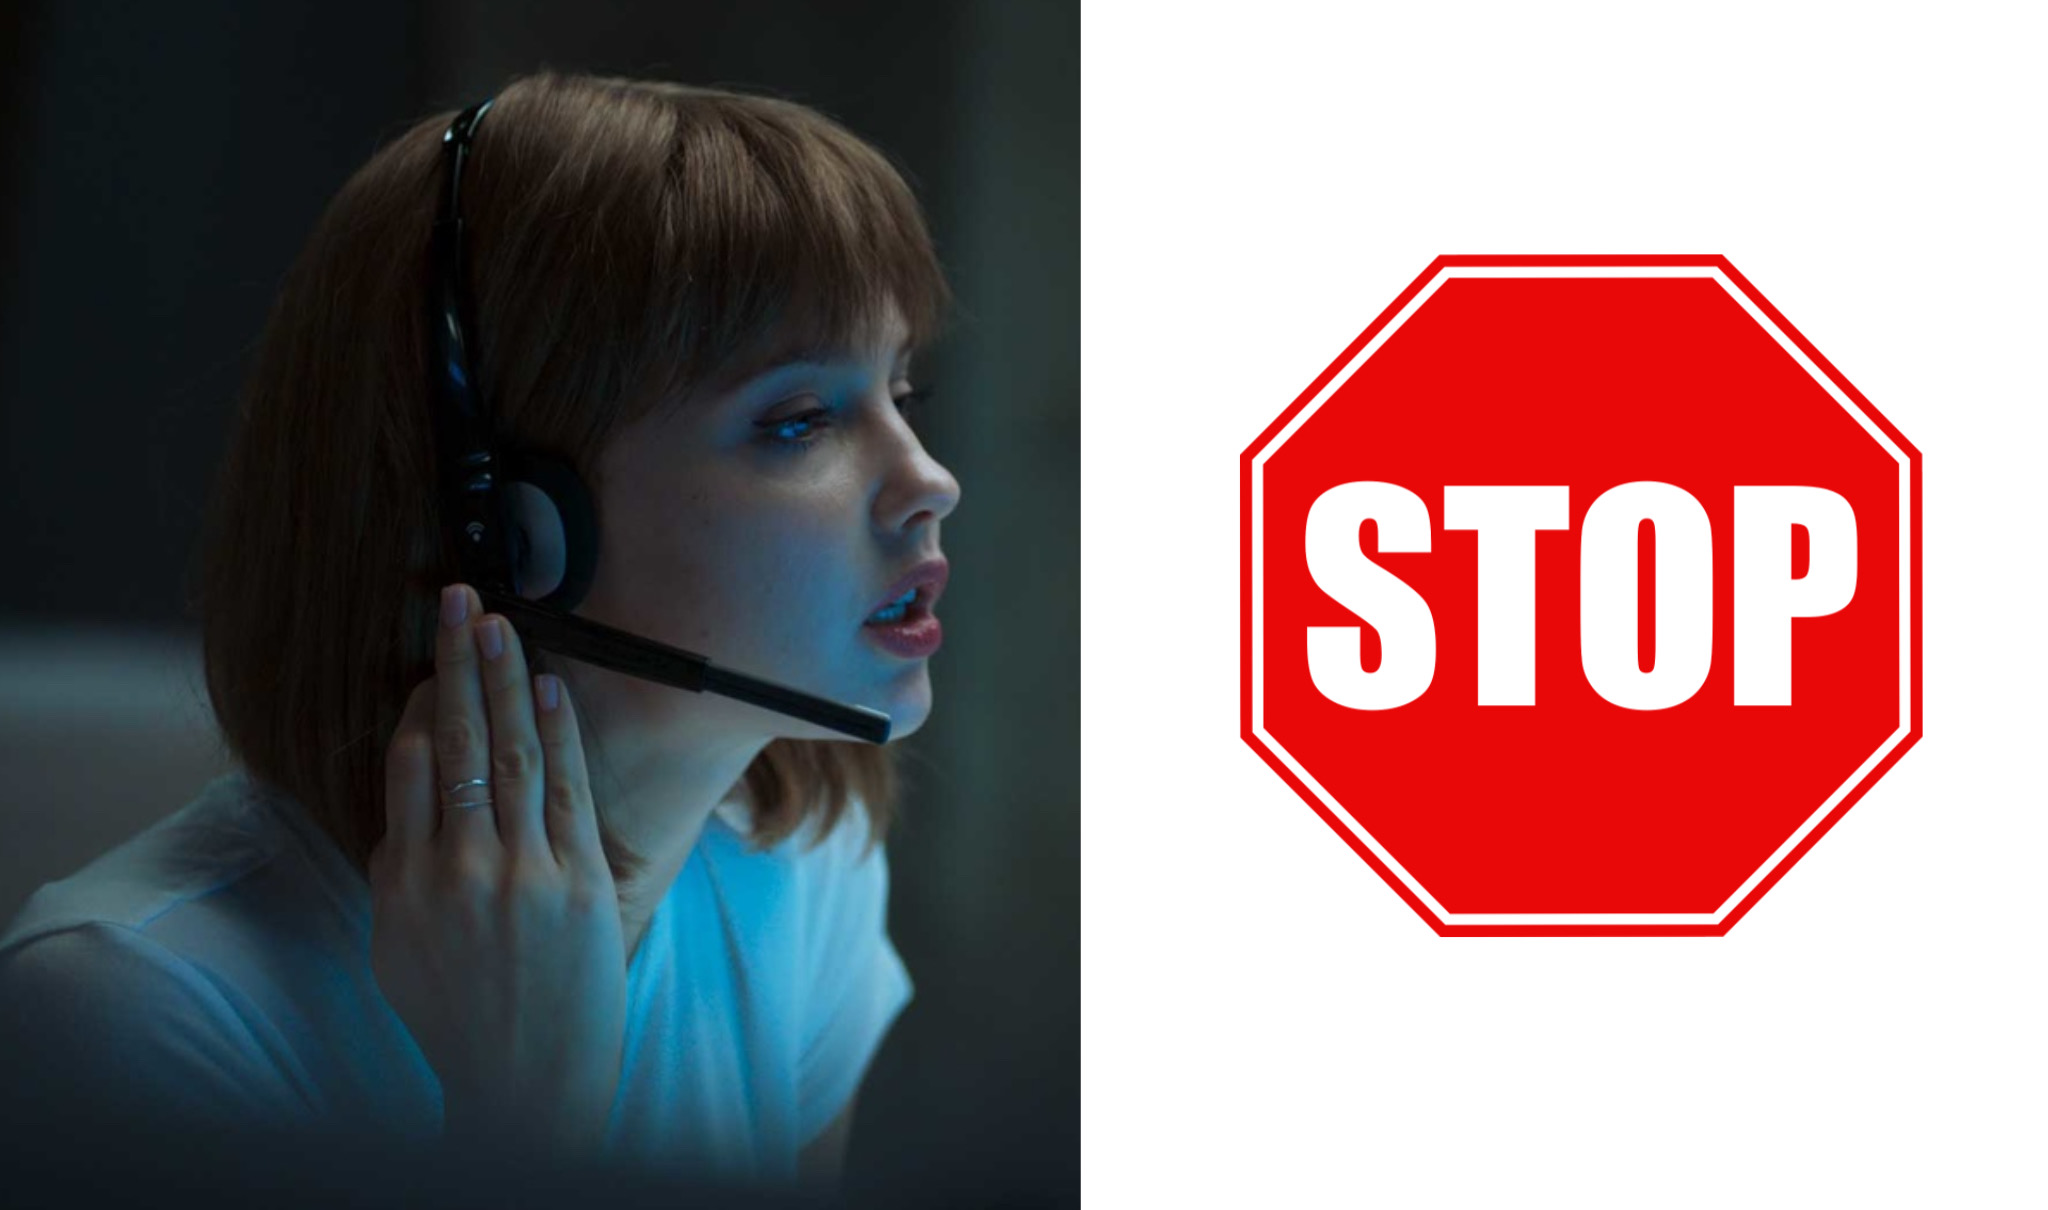 Call Center Stop